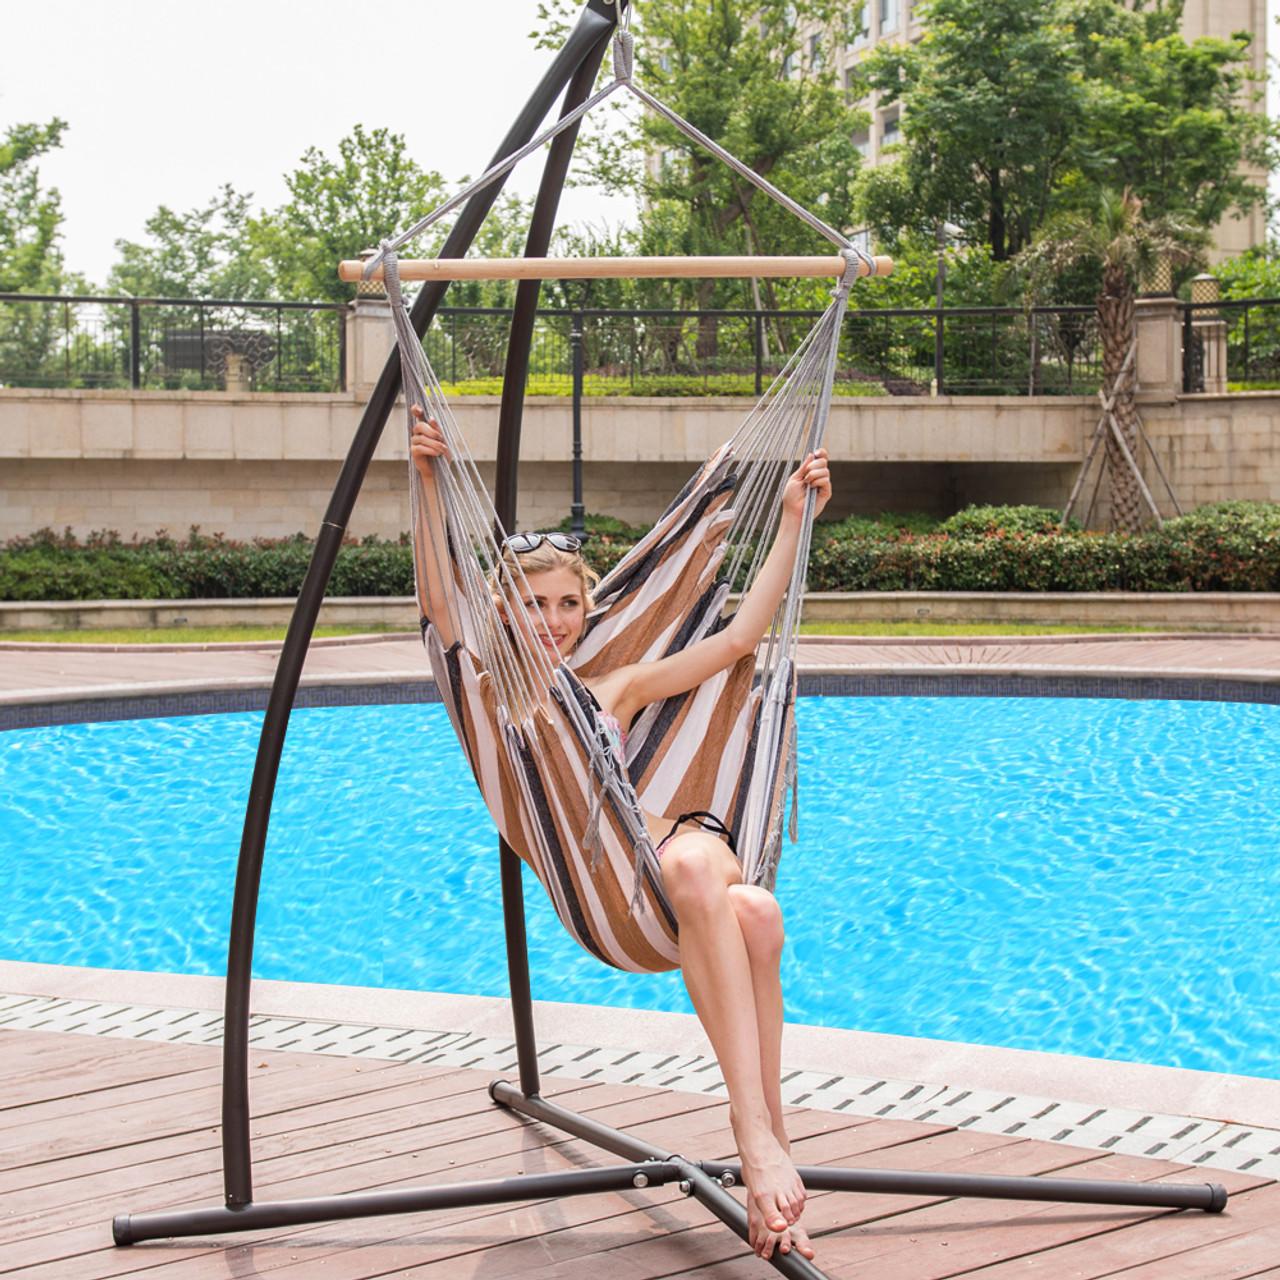 Lazy daze hammocks canvas hanging hammock swing chair seat with wood spreader bar desert stripe